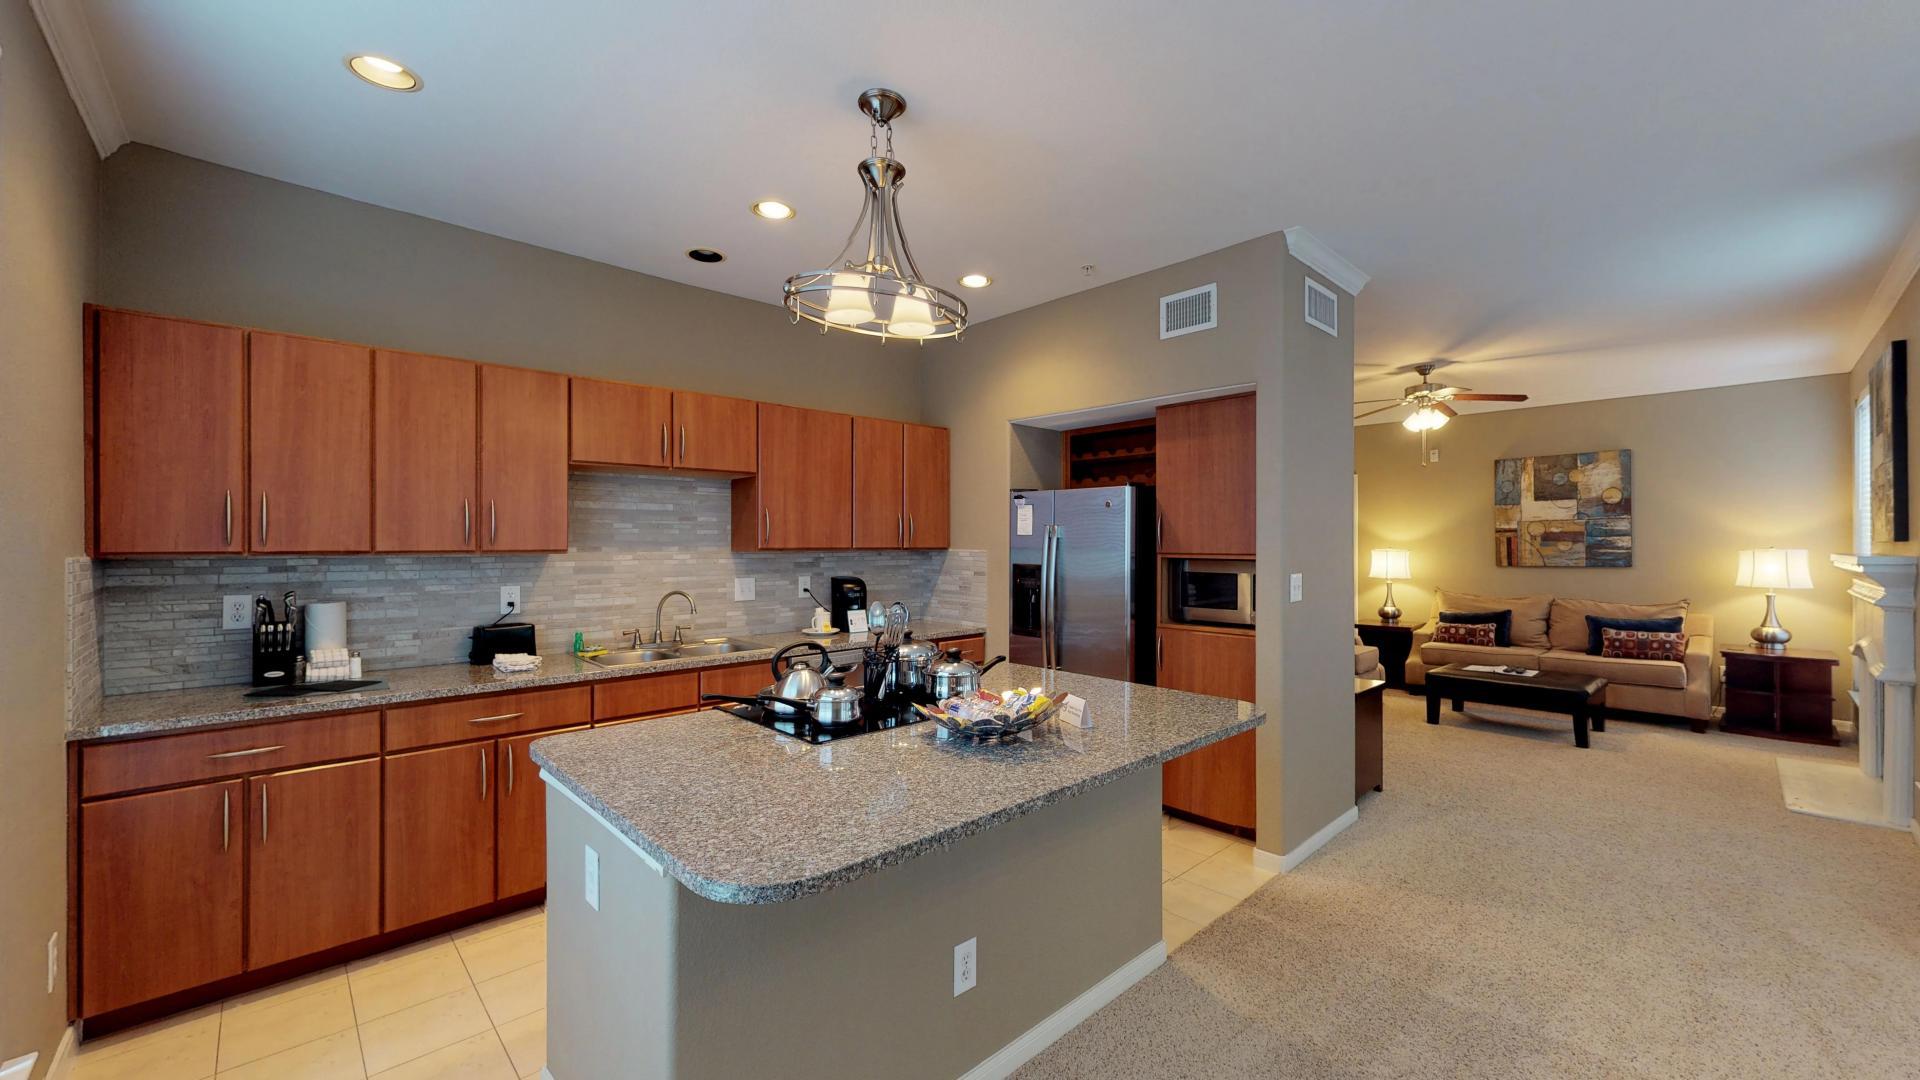 Kitchen at San Paloma Corporate Housing